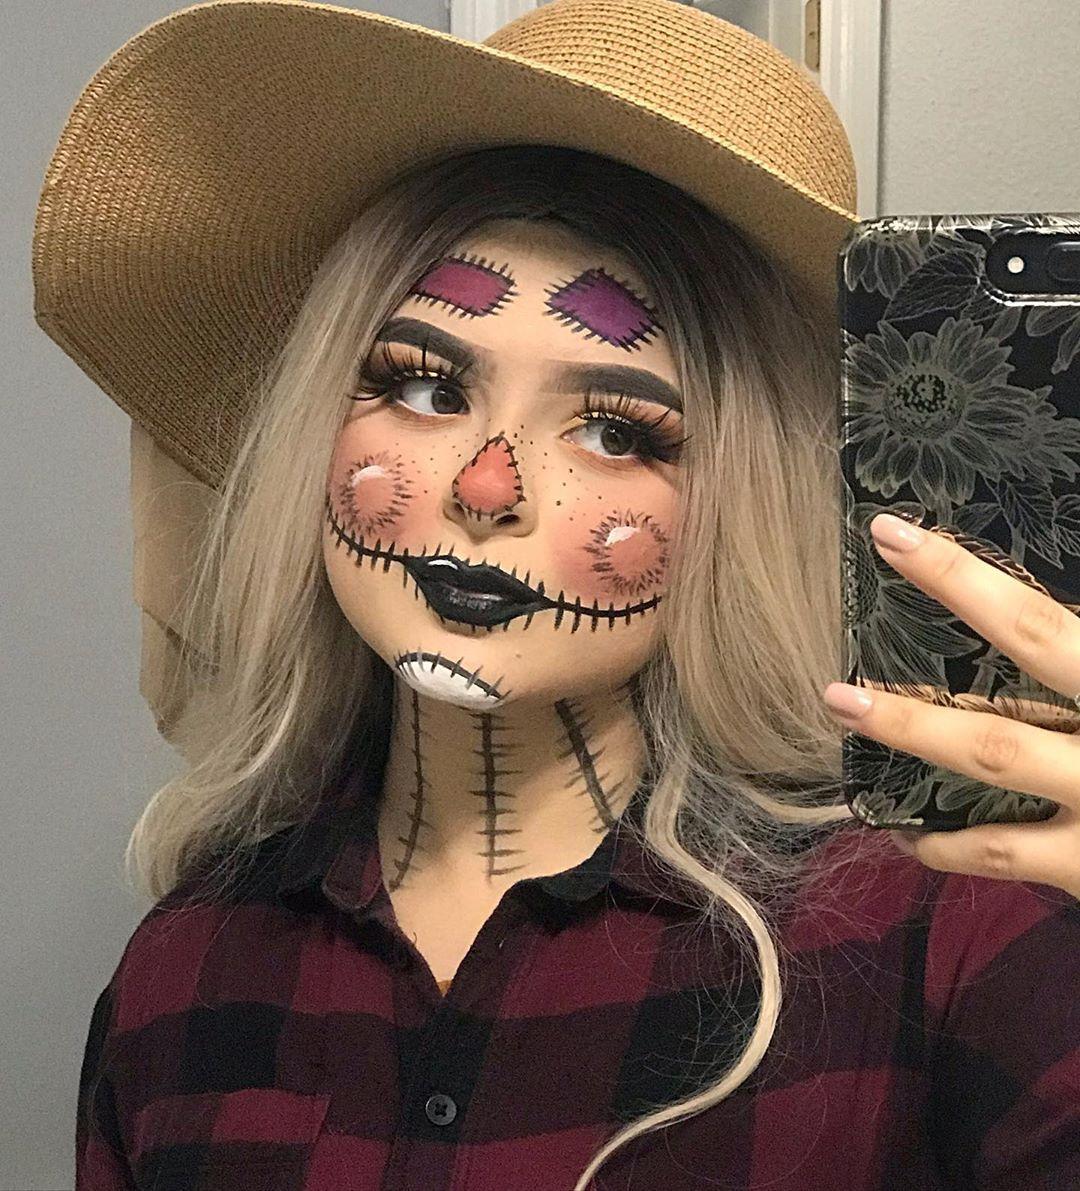 Last Minute Kostüme Selber Machen | Last Minute Halloween verwandt mit Halloween Kostüm Selber Machen Last Minute